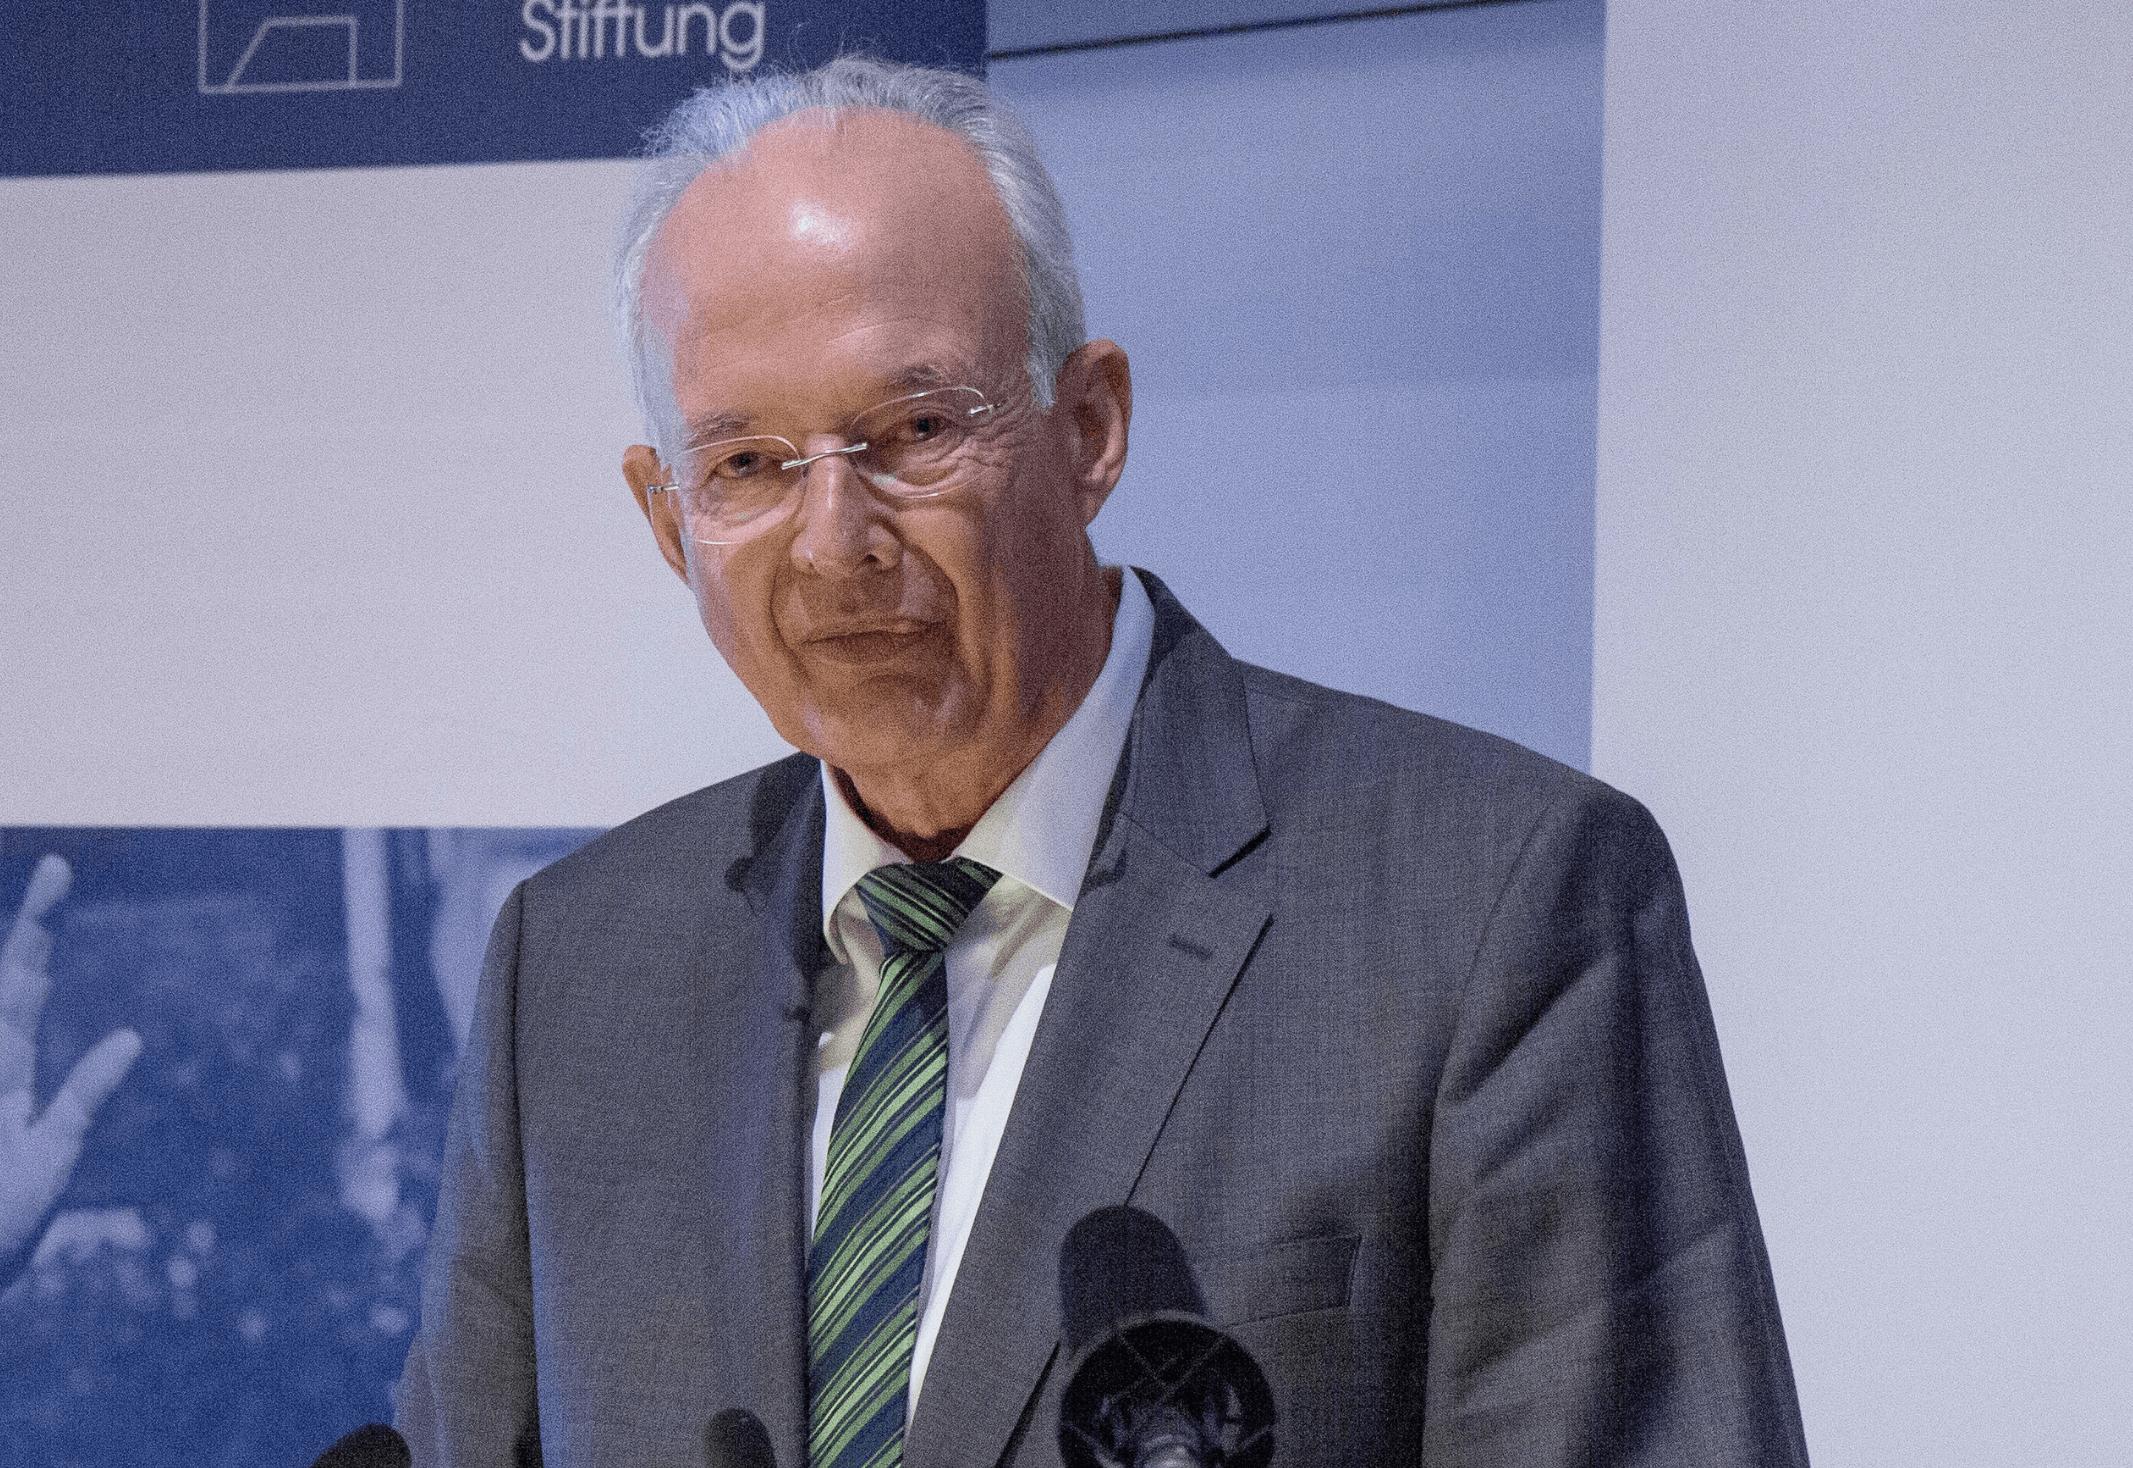 Paul Kichhof